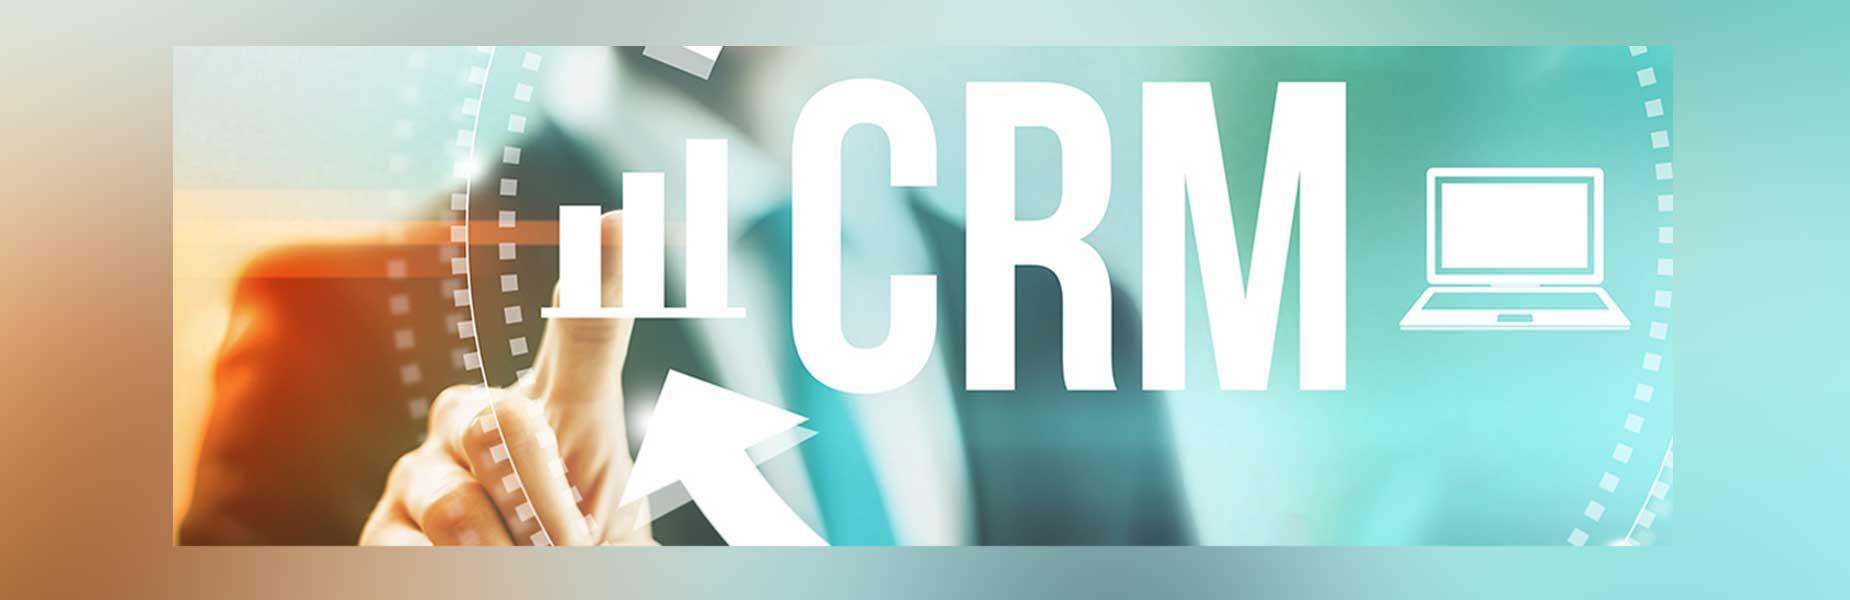 CRM oline en empresas